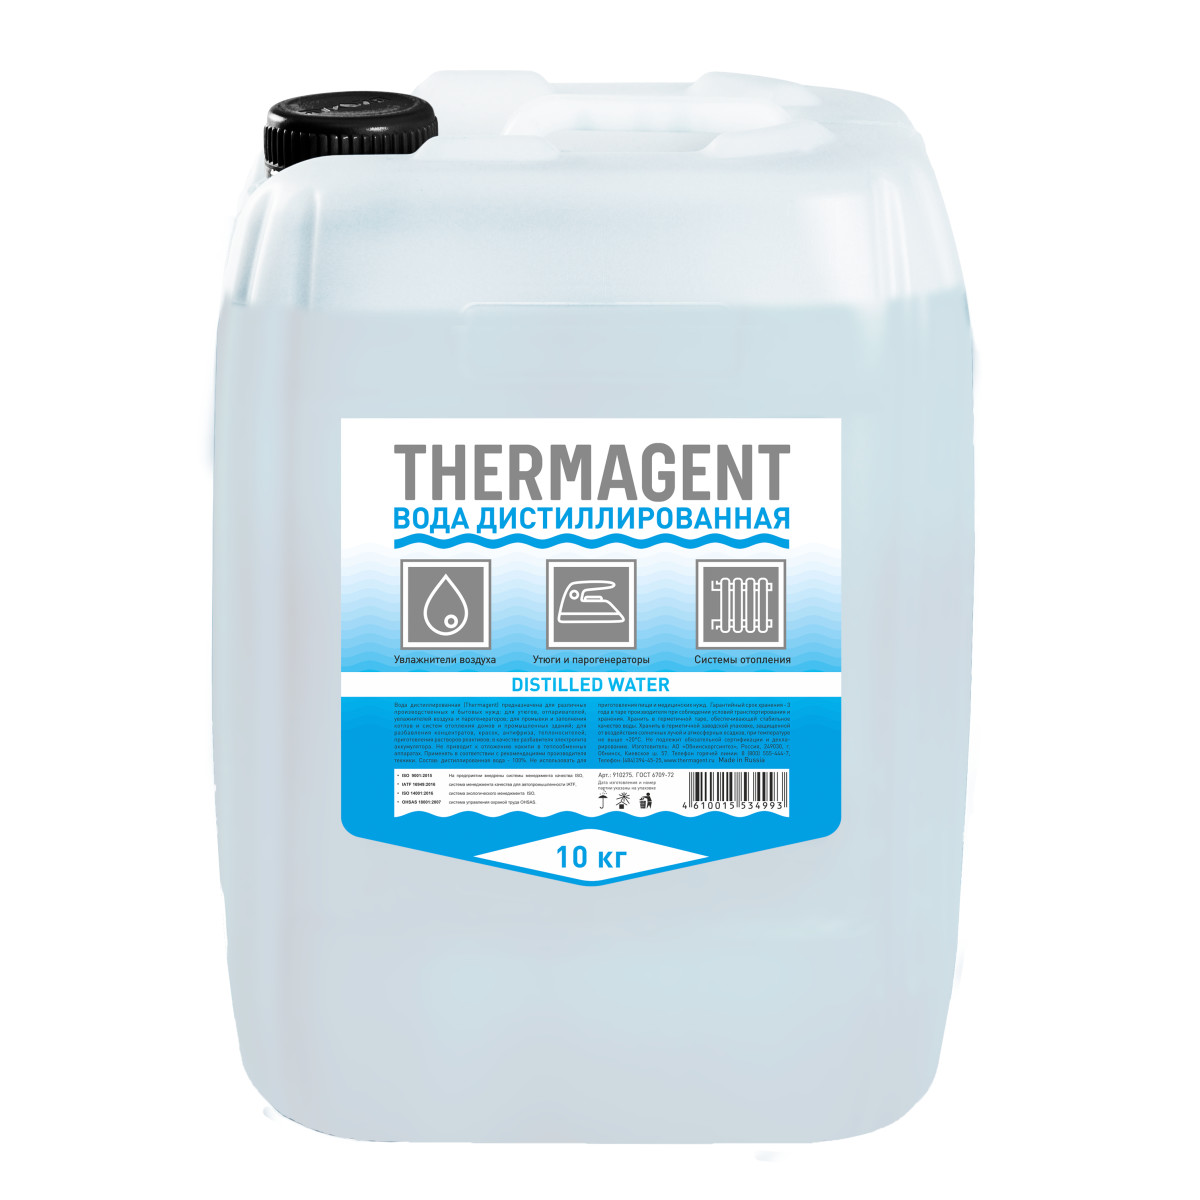 Вода дистиллированная Thermagent 10 л